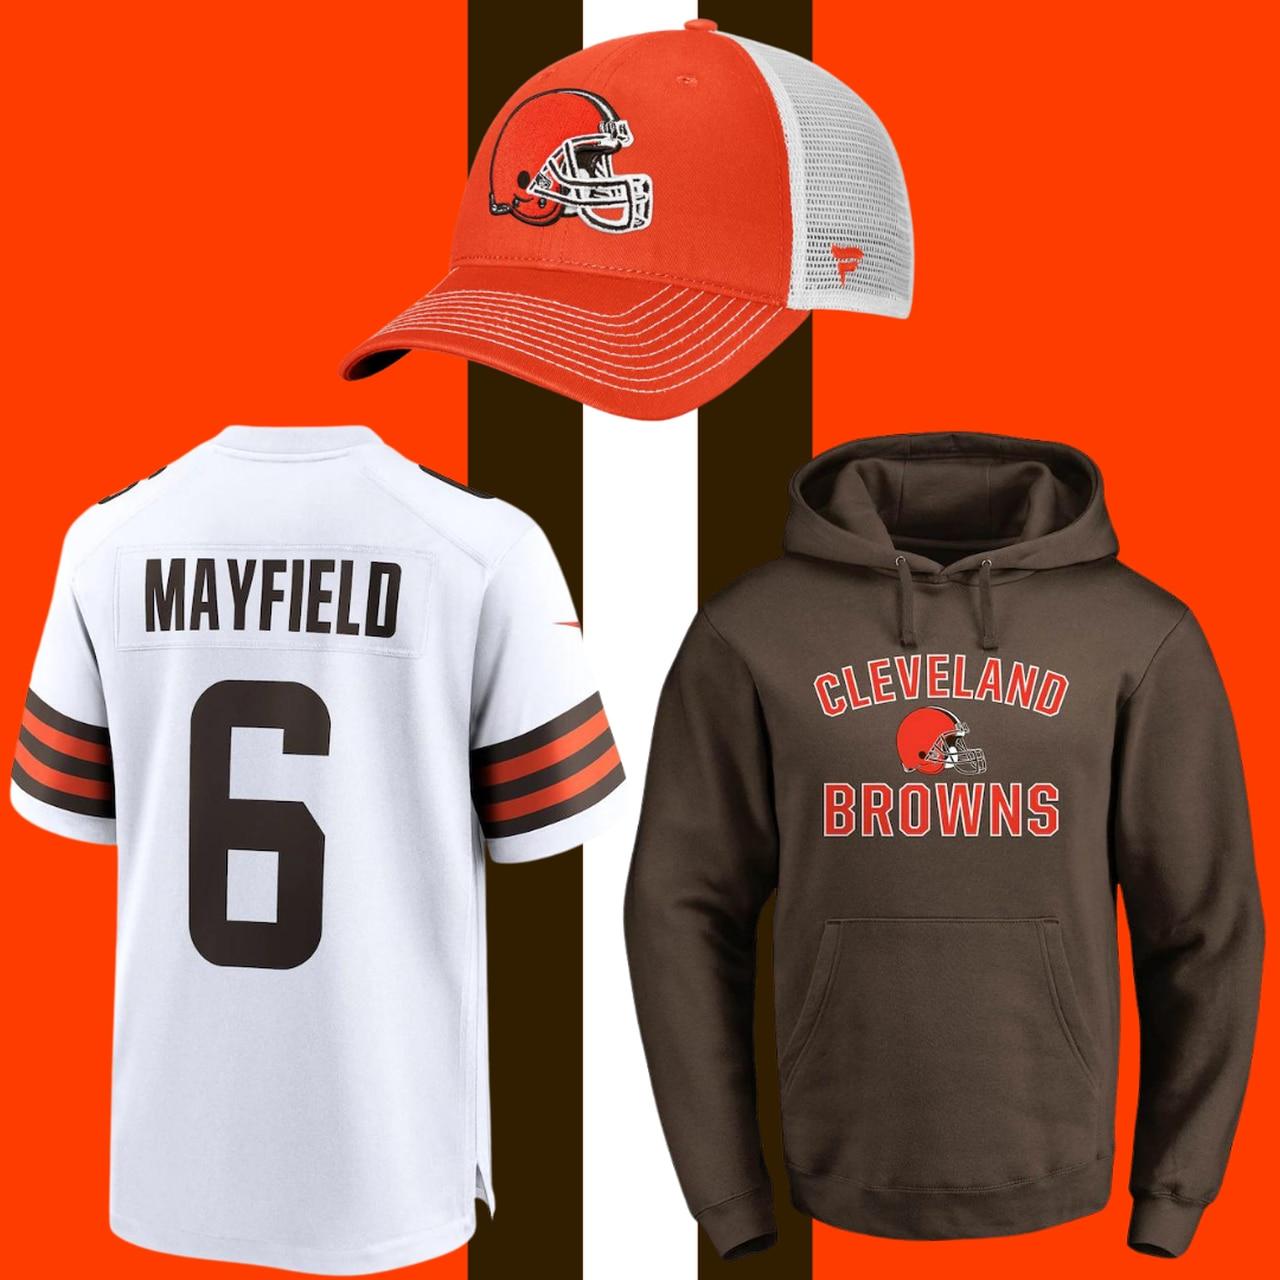 Browns Affiliate Gear